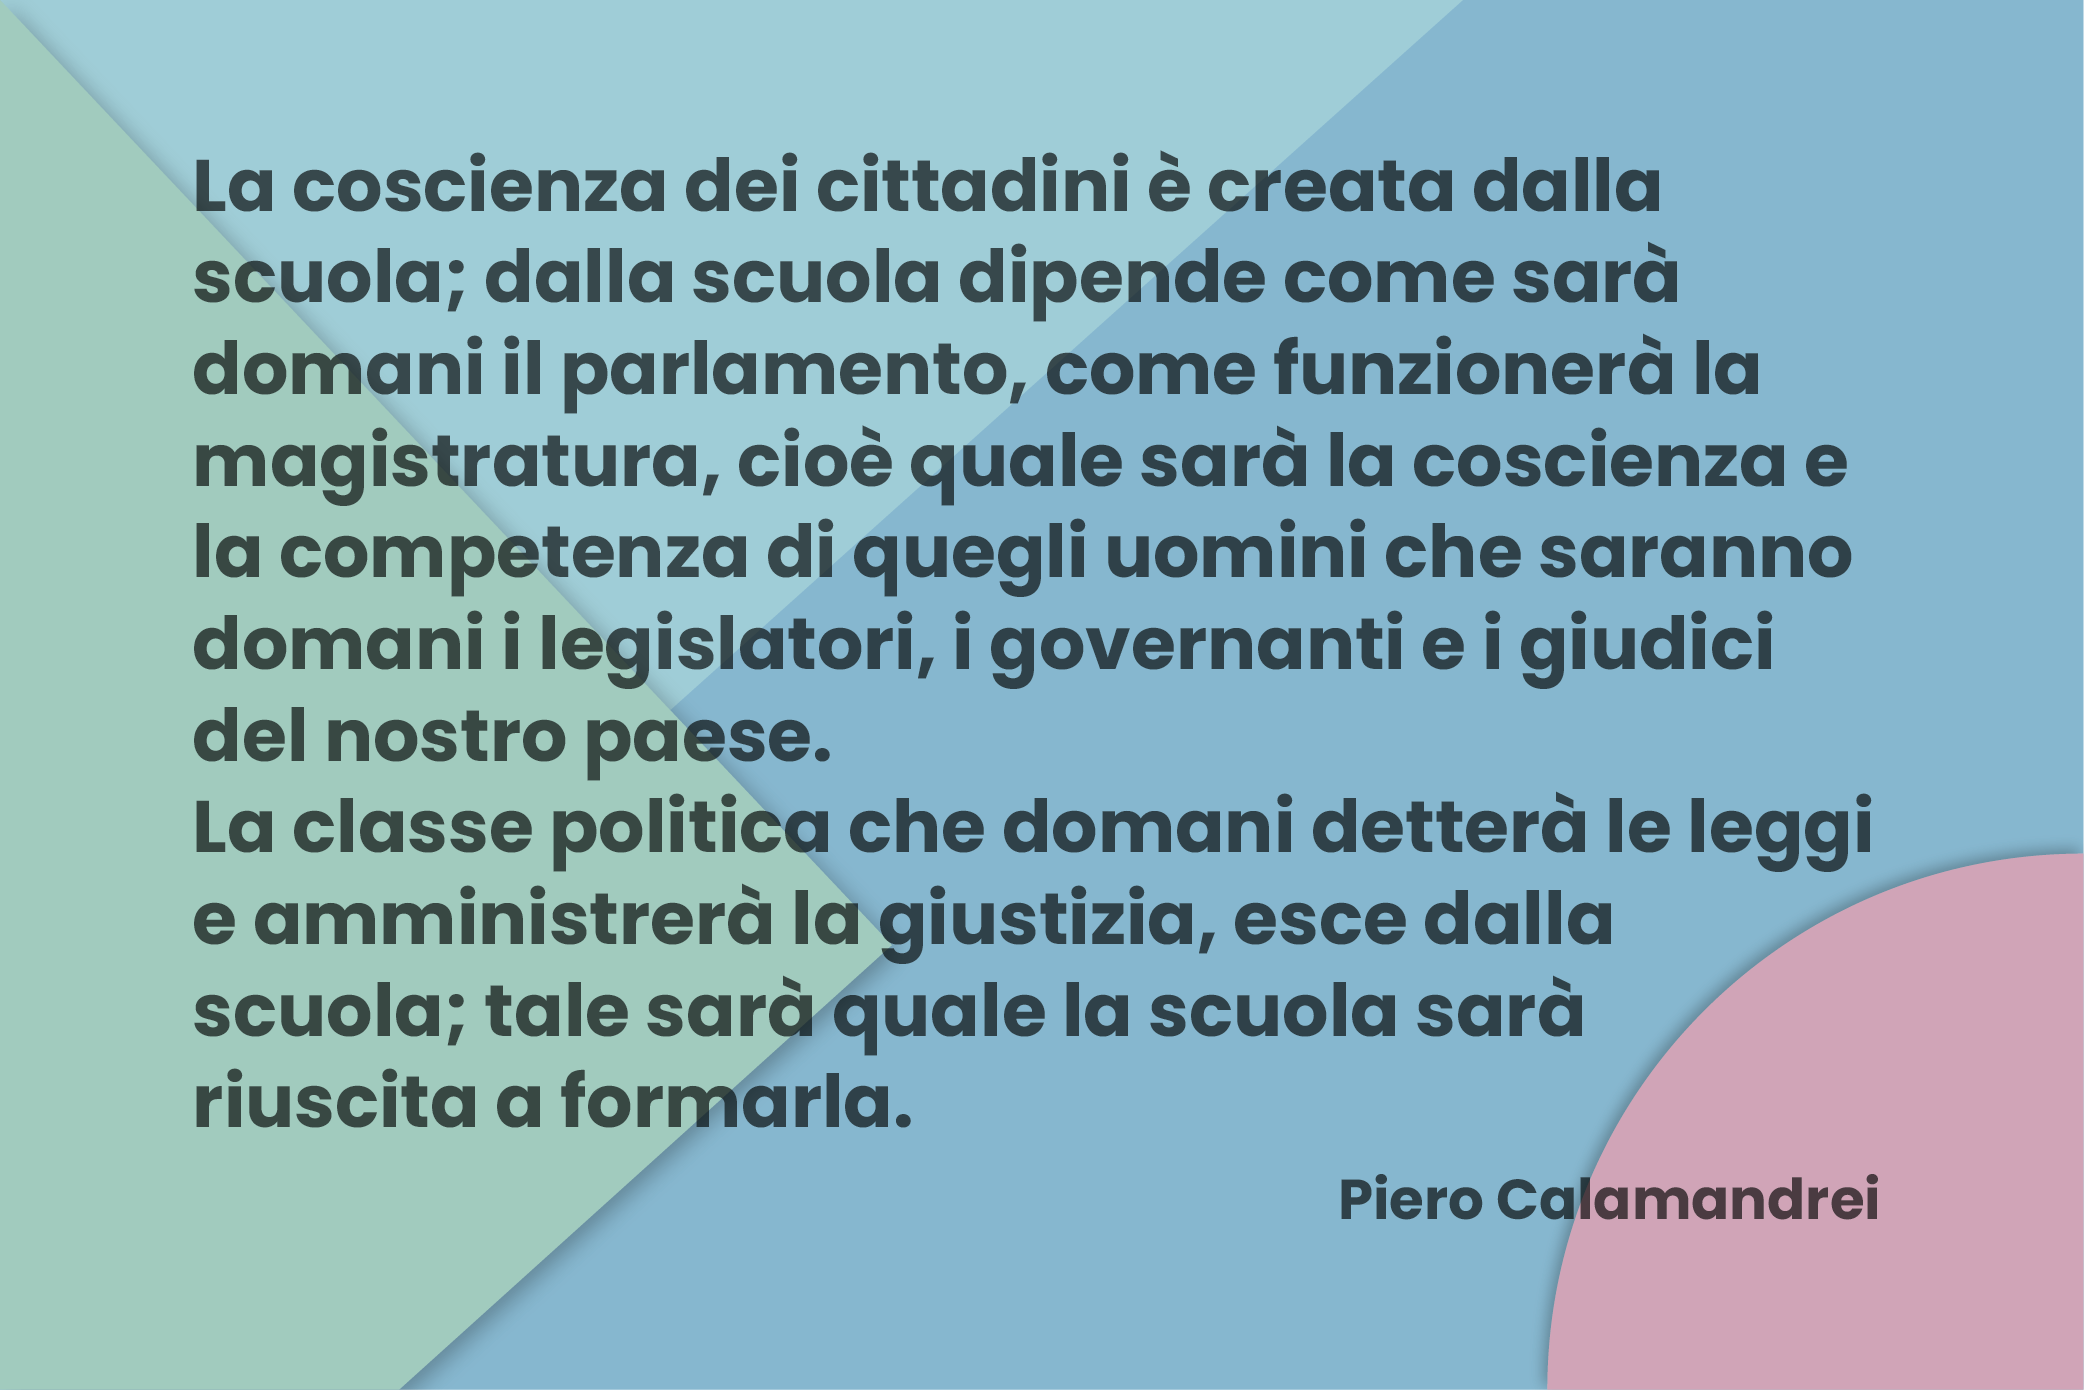 frase di Piero Calamandrei